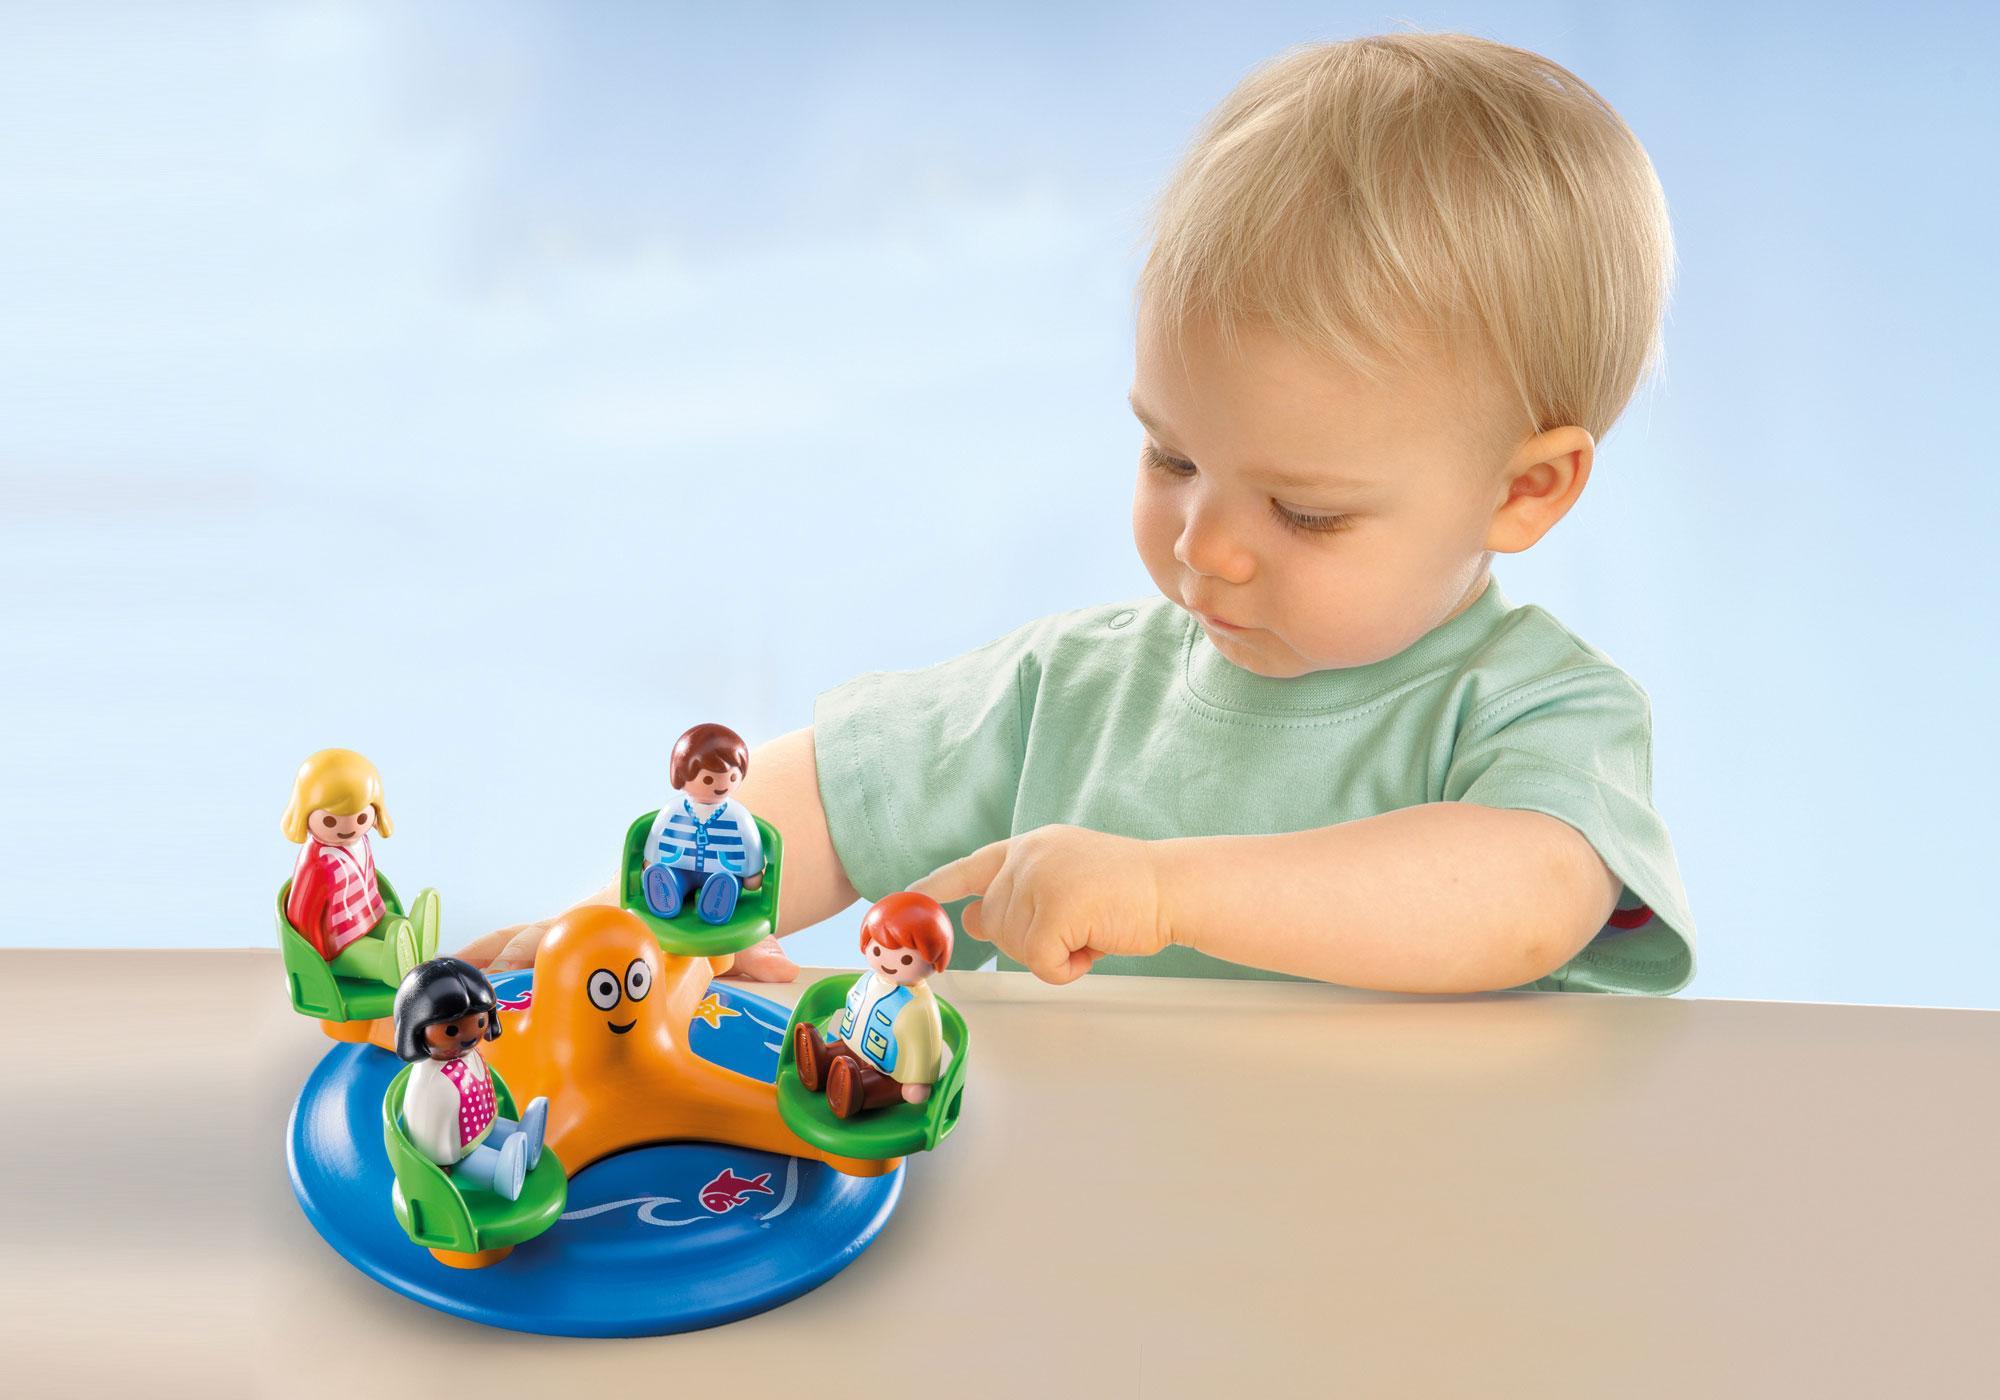 http://media.playmobil.com/i/playmobil/9379_product_extra1/1.2.3 Carrossel Infantil